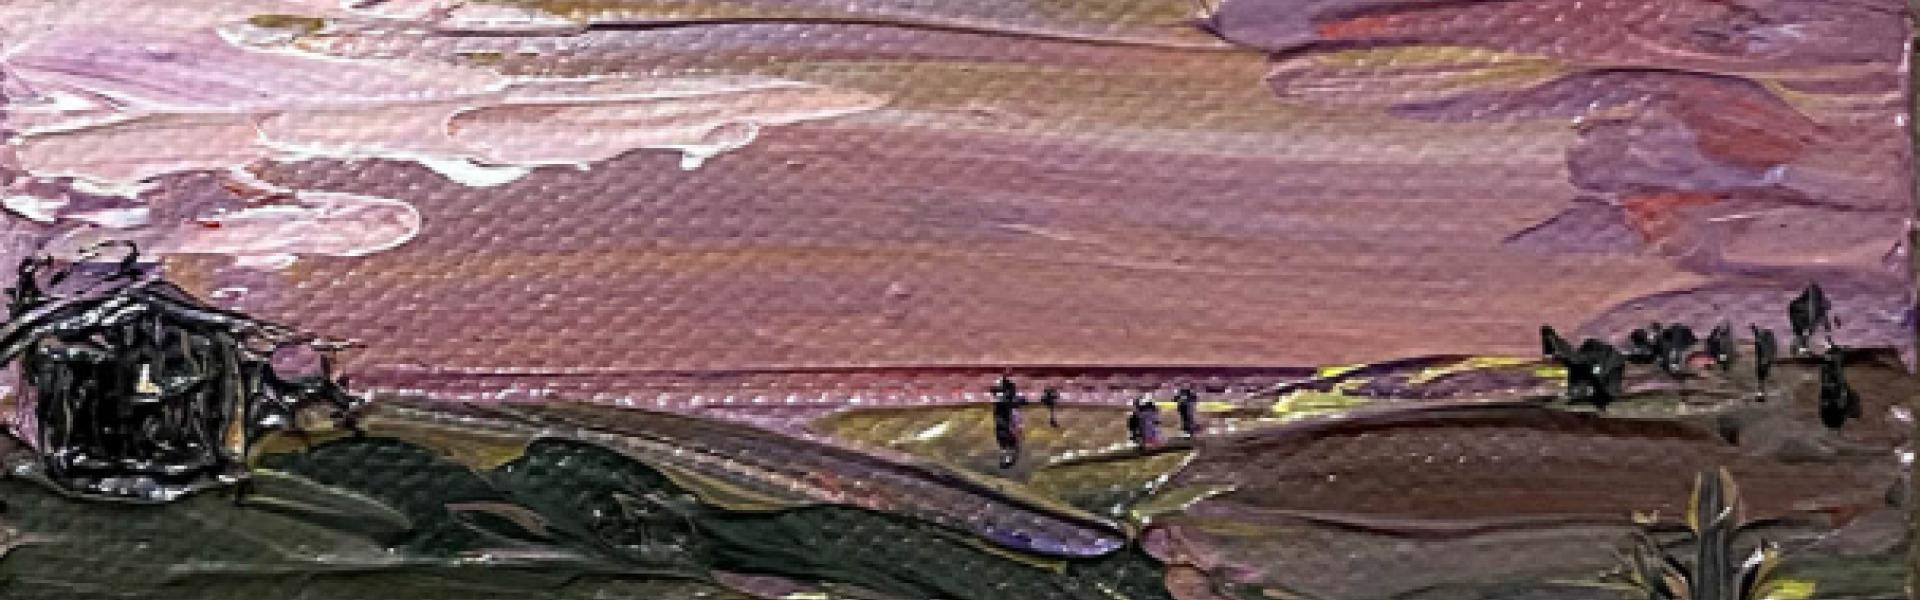 banner_Burdick-Meaghen-Purplehues-acryliconcanvas-5x5inches-50.20210507093801.jpg